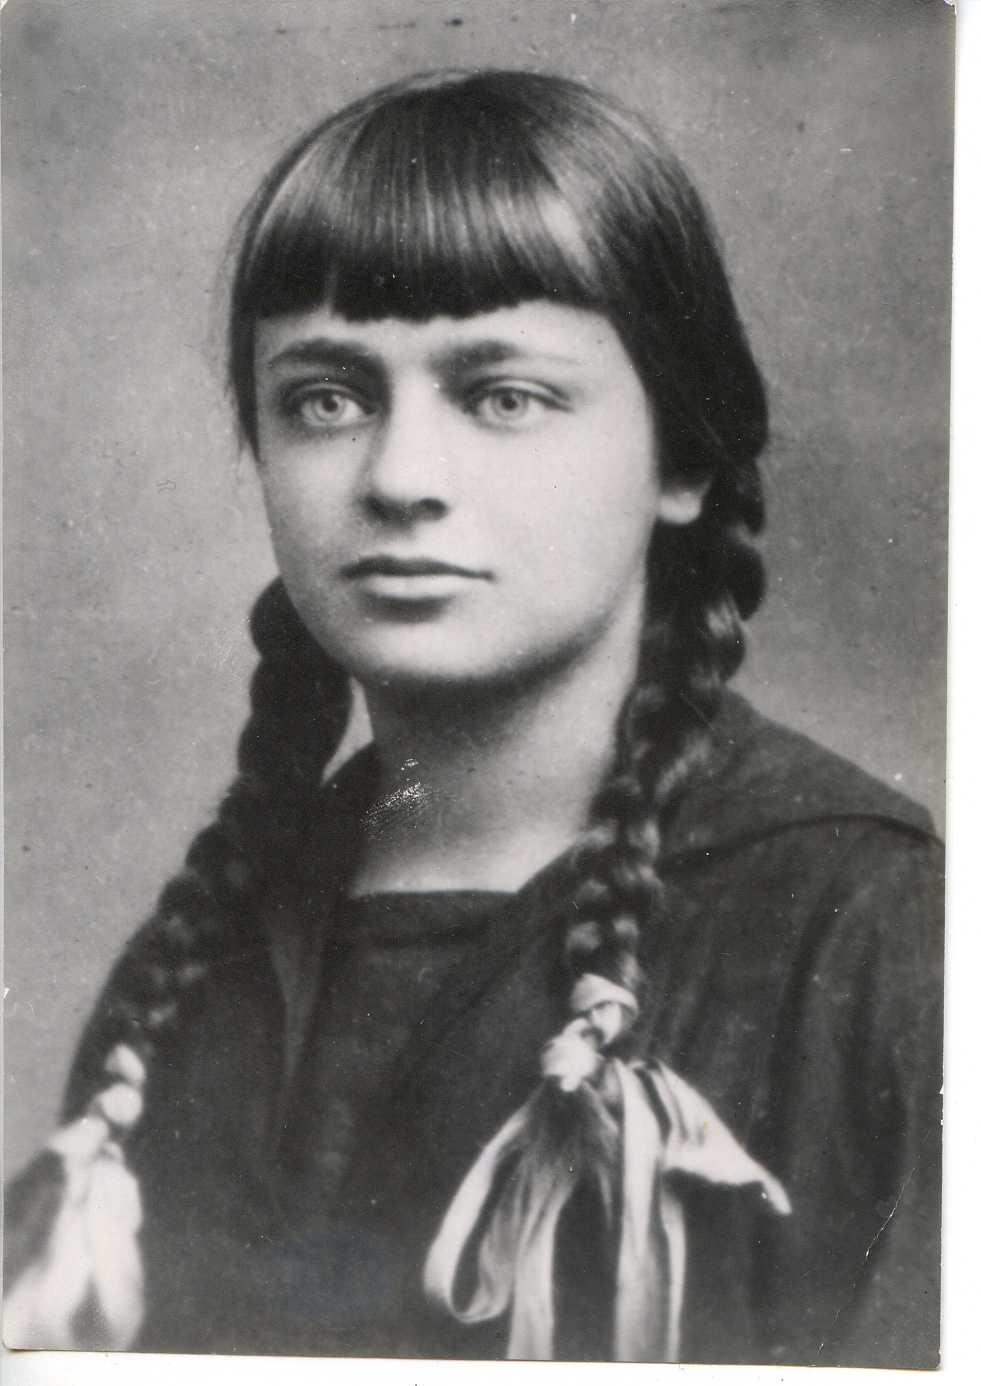 Ariadna Ėfron